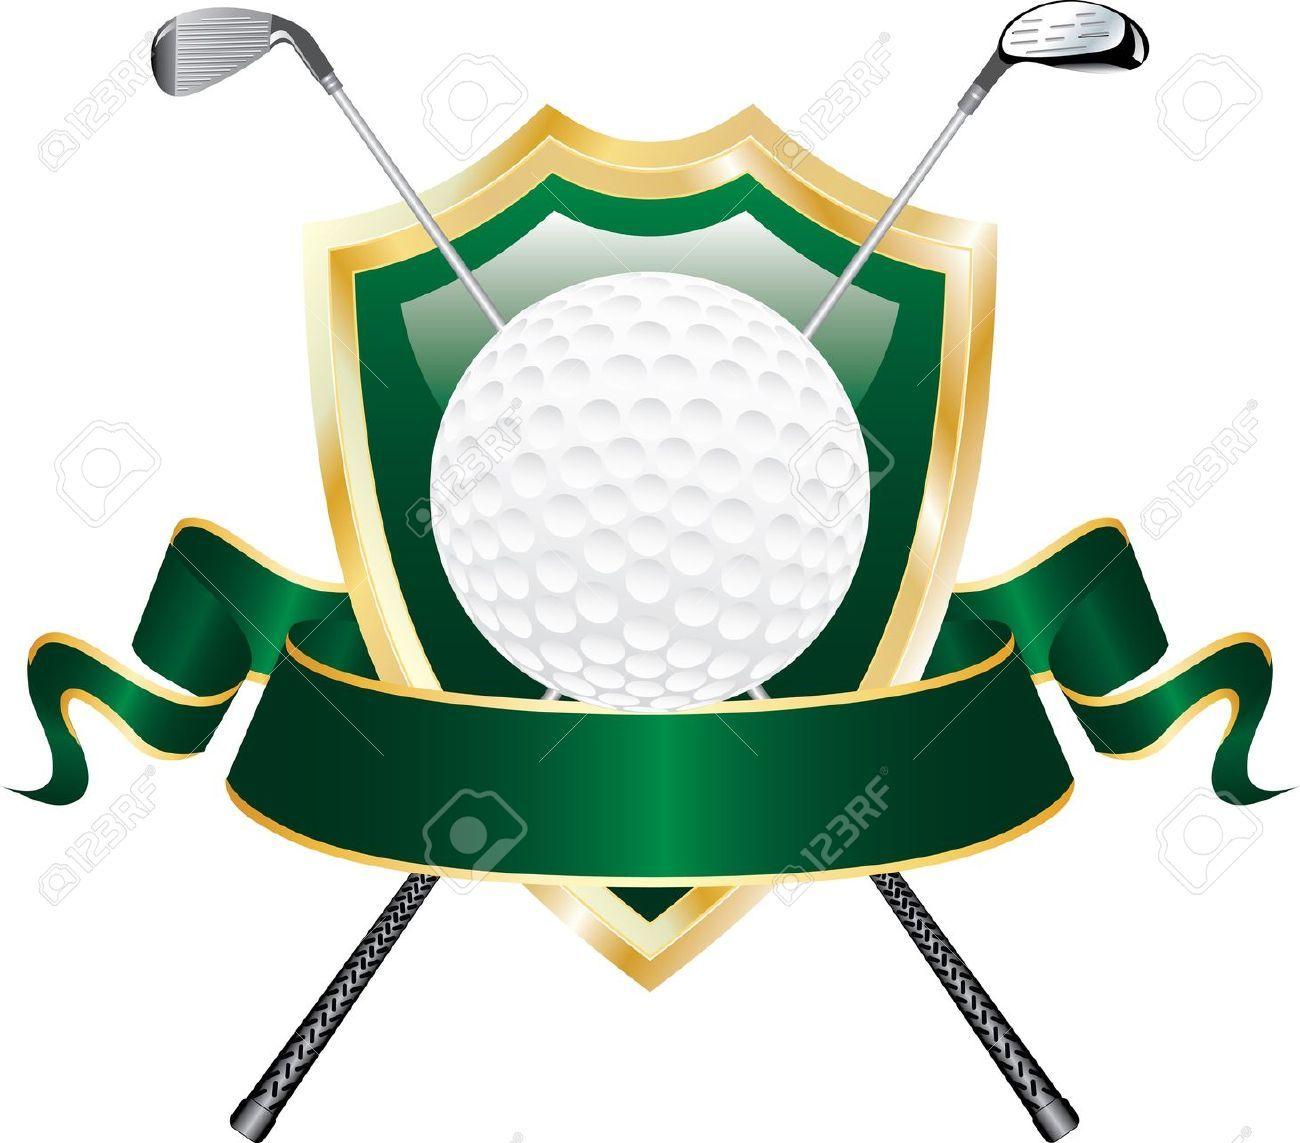 Golf clipart award. Stock vector design blank